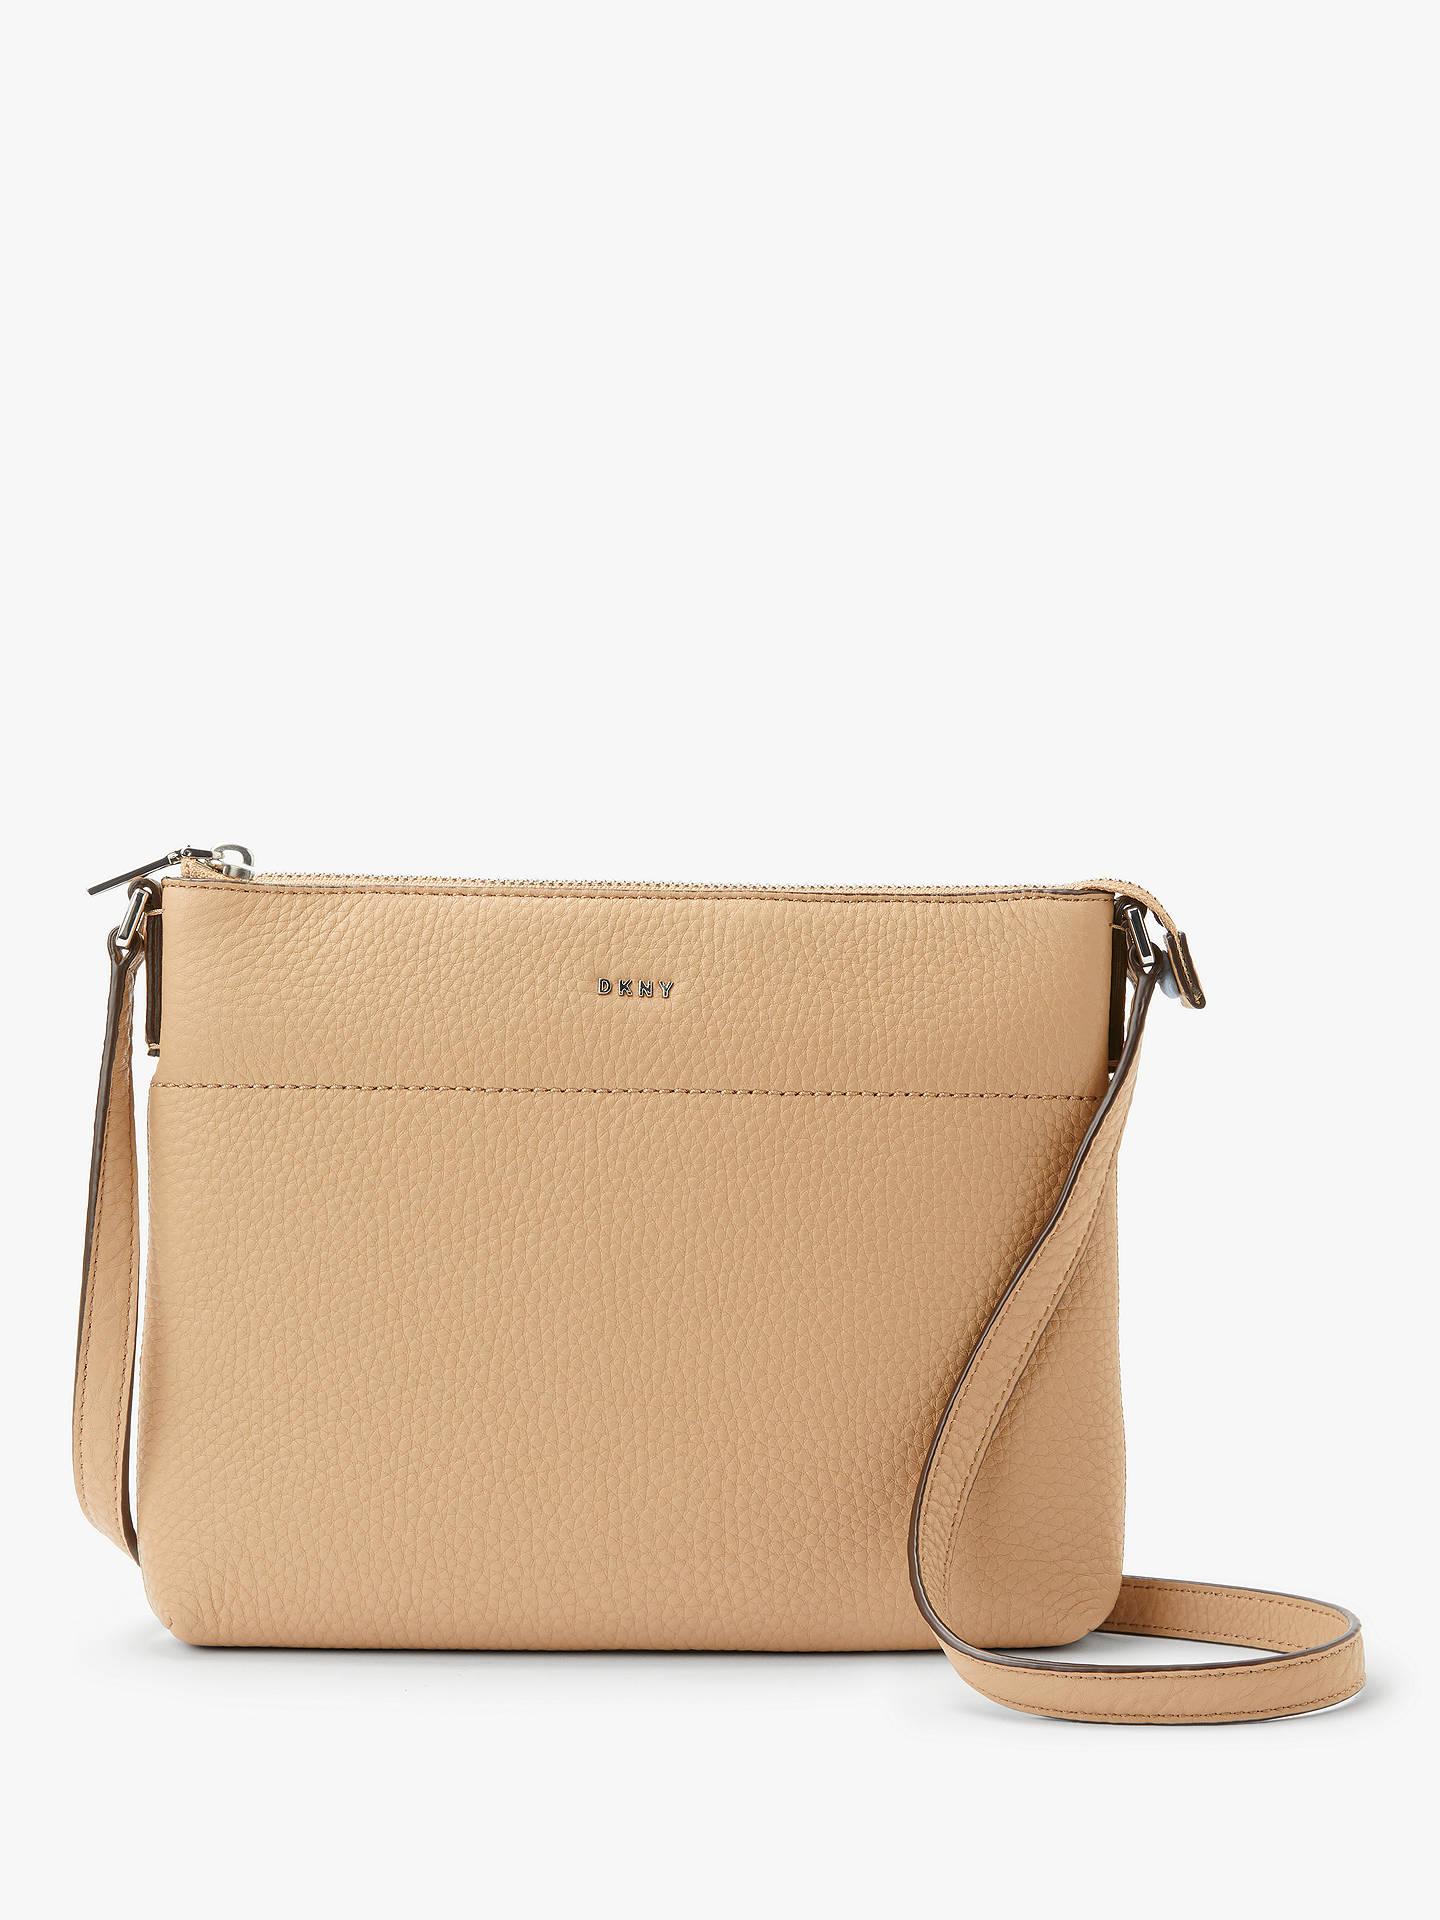 41c121ecc1 Buy DKNY Bellah Leather Cross Body Bag, Camel Online at johnlewis.com ...